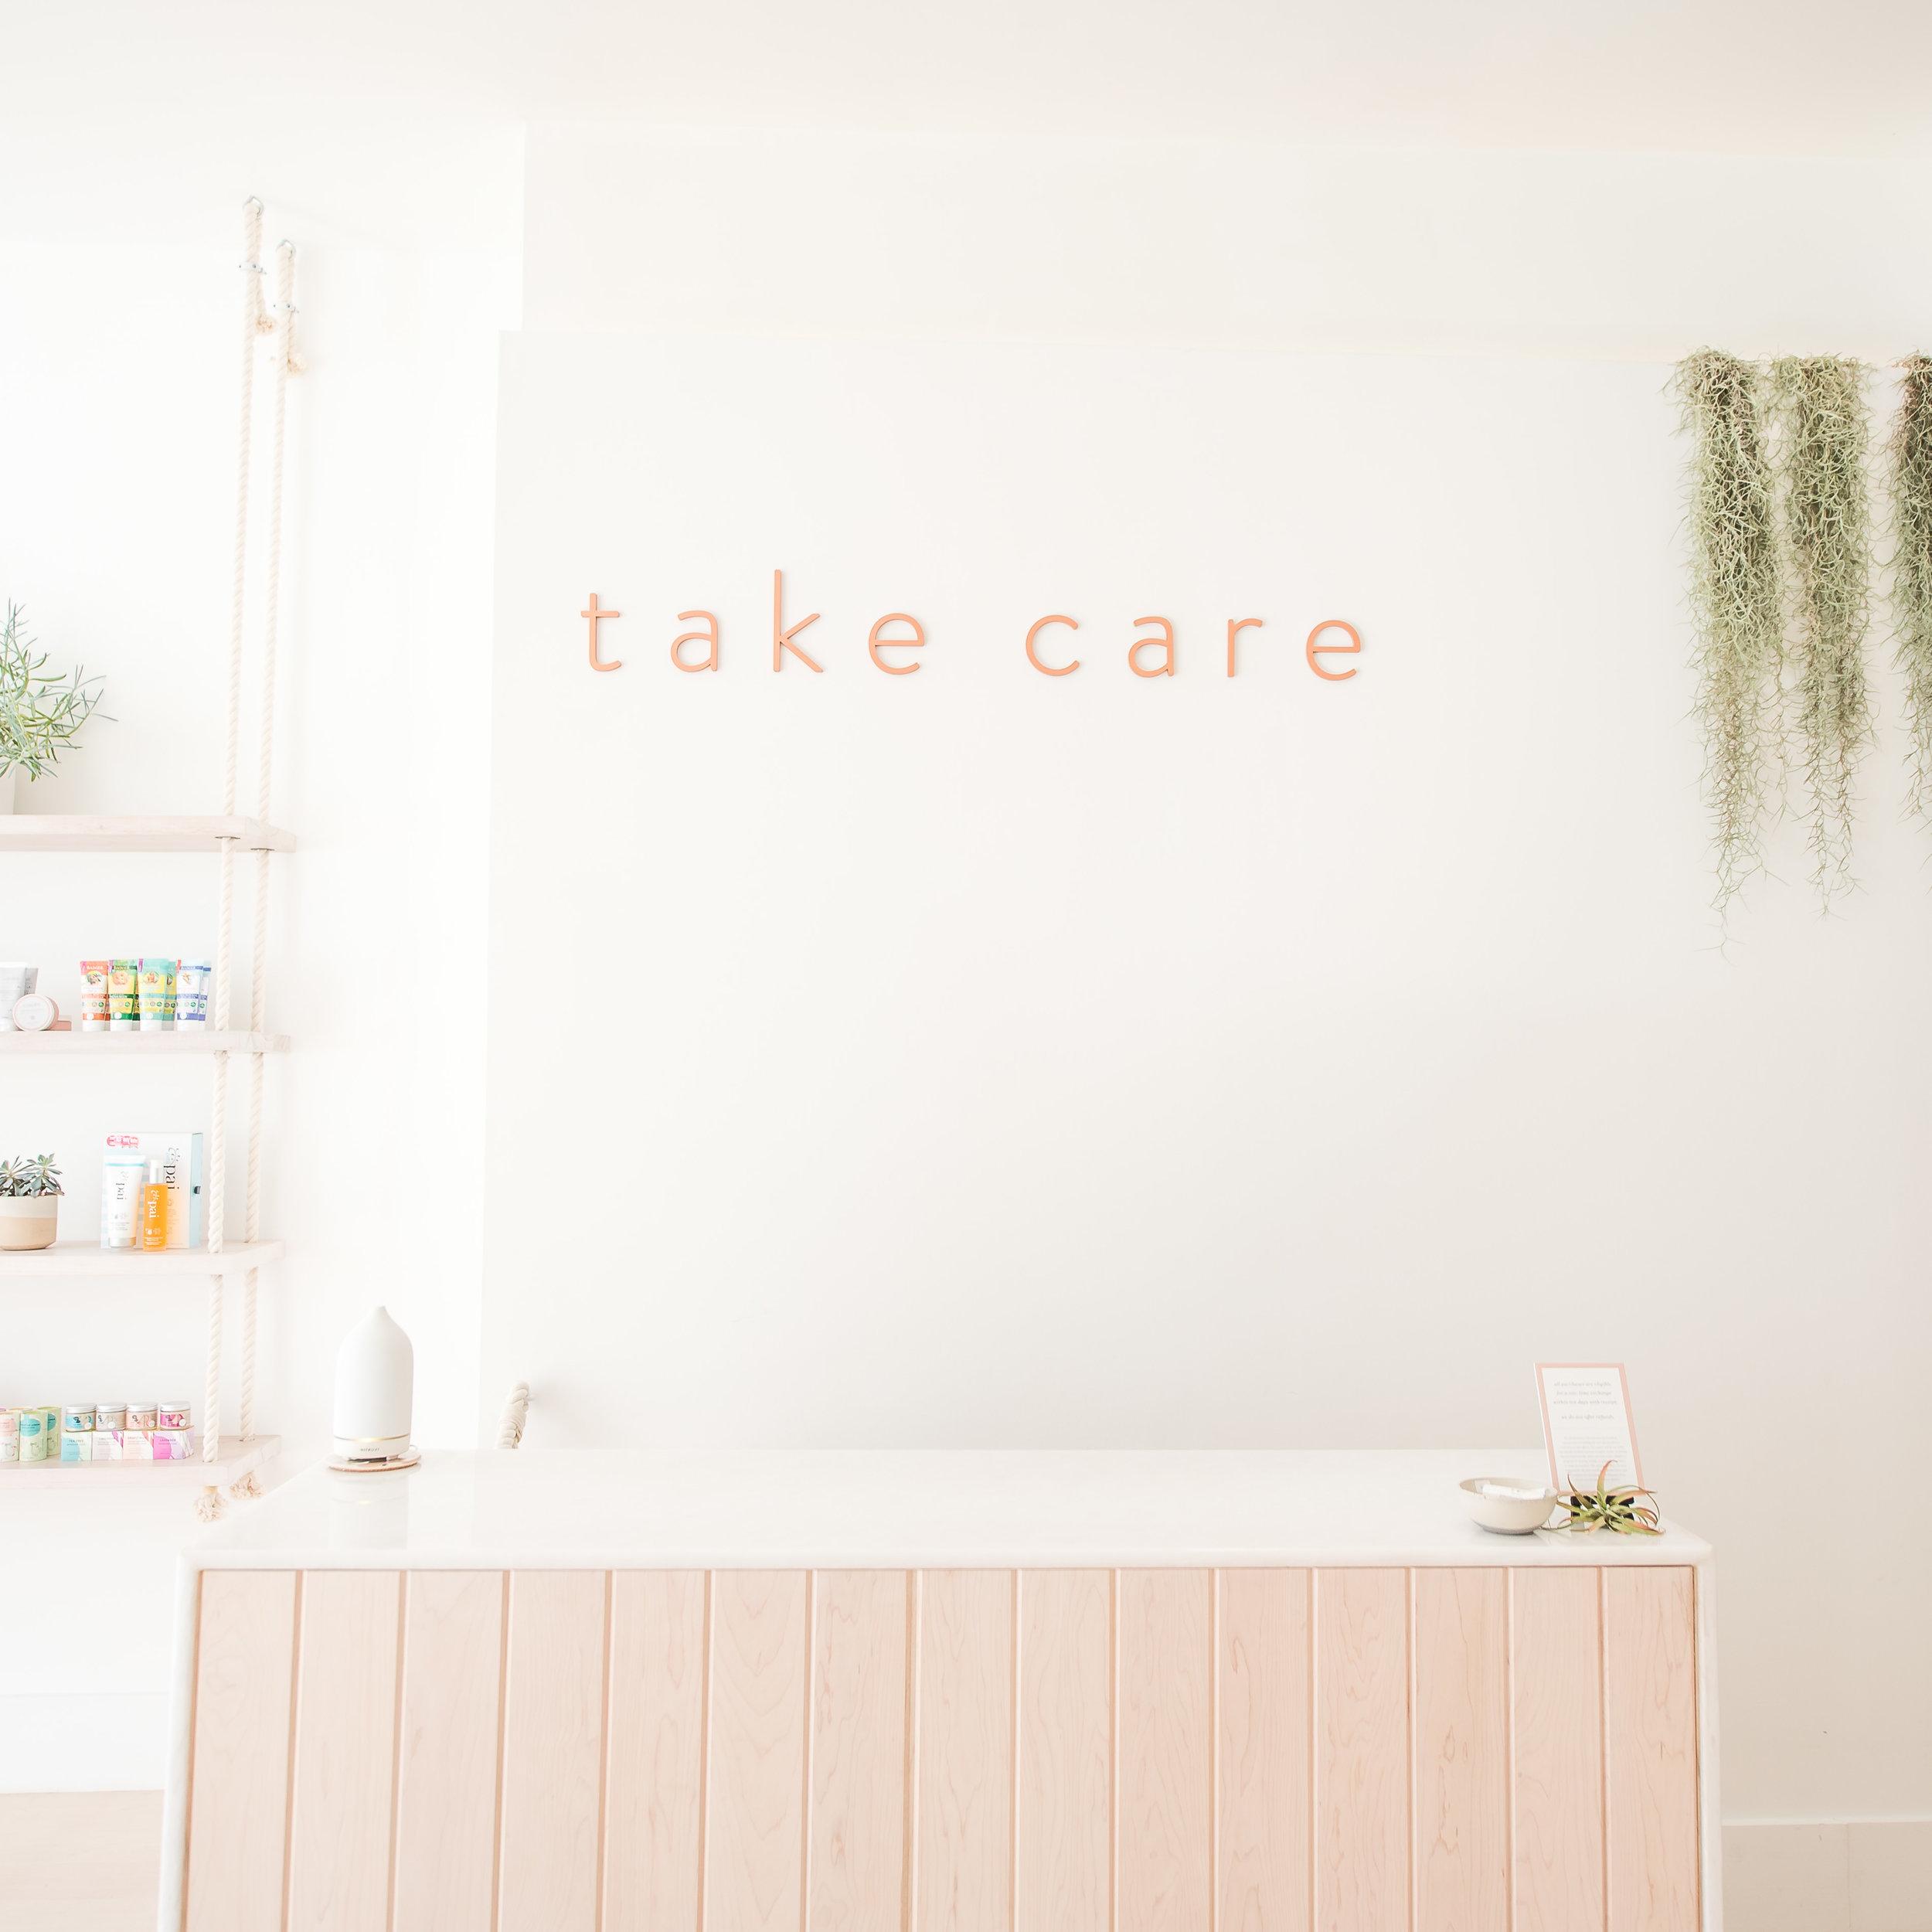 Erin-Fabio-Photography-Take-Care-August-Store-2018-11.jpg